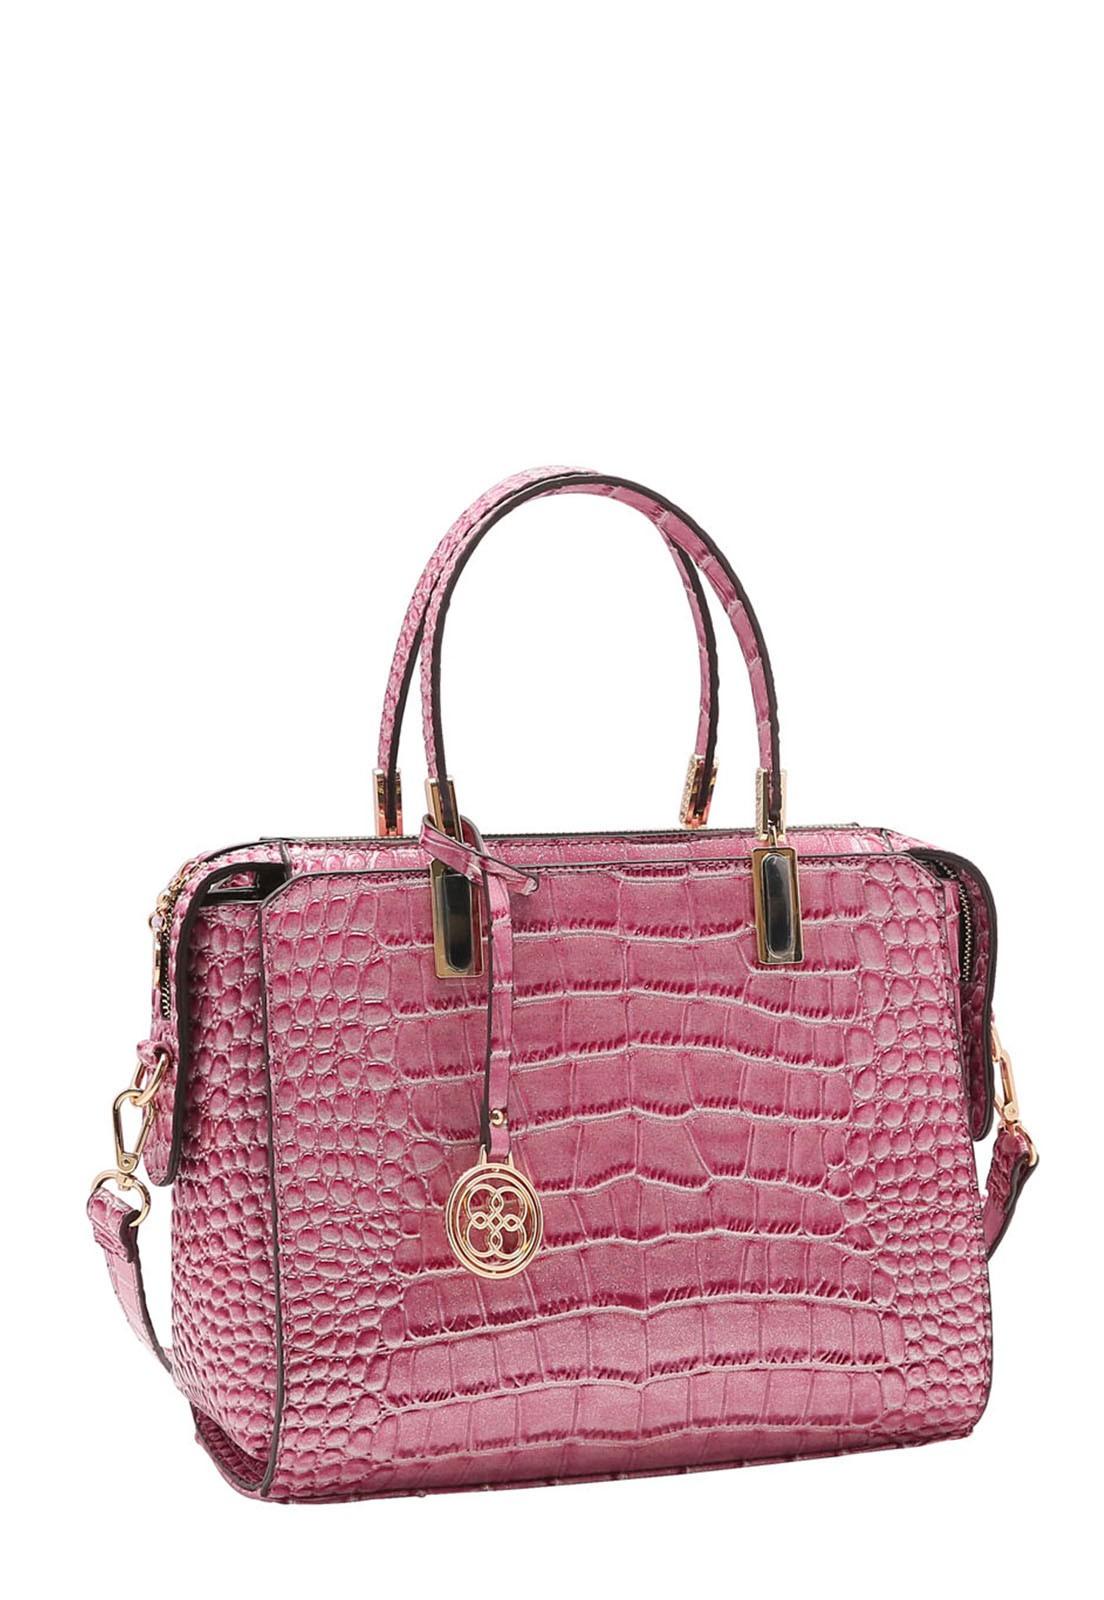 Bolsa Feminina Chenson Croco Gliter de Mão 3483197